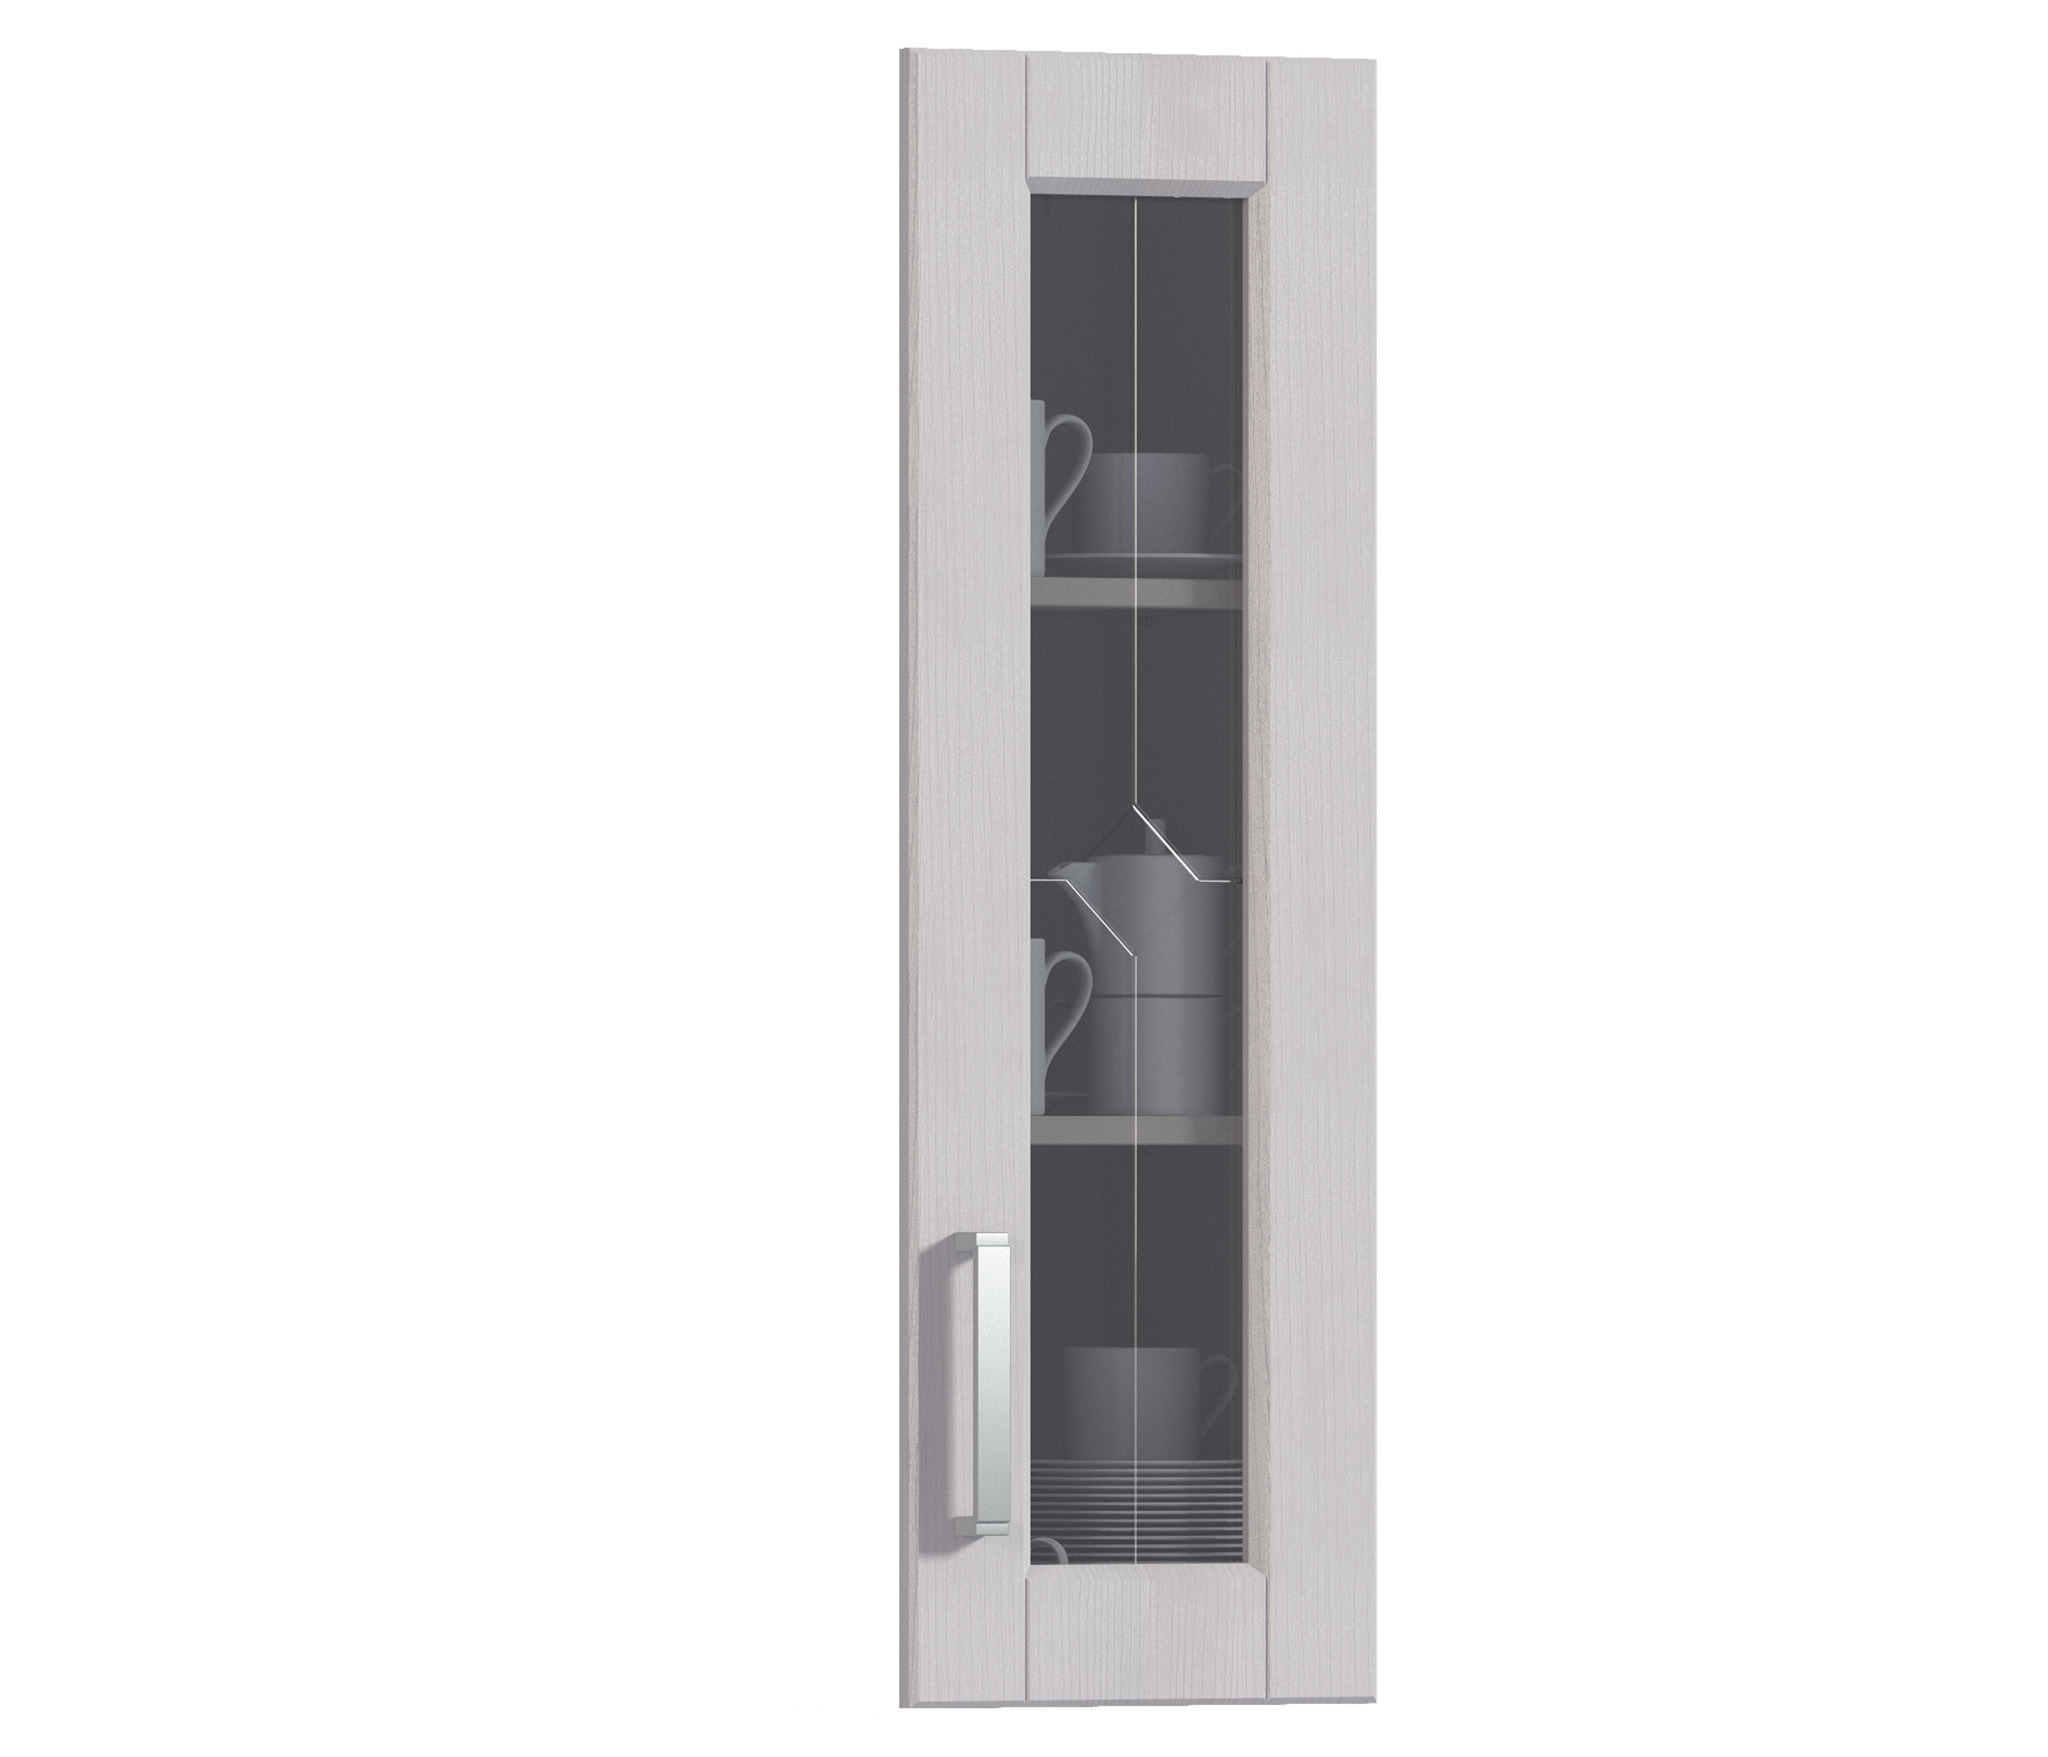 Фасад Регина ФВ-130 к корпусу РП-130. РП-160Мебель для кухни<br>Дверца для шкафа, дополненная декоративным стеклом.<br><br>Длина мм: 296<br>Высота мм: 920<br>Глубина мм: 22